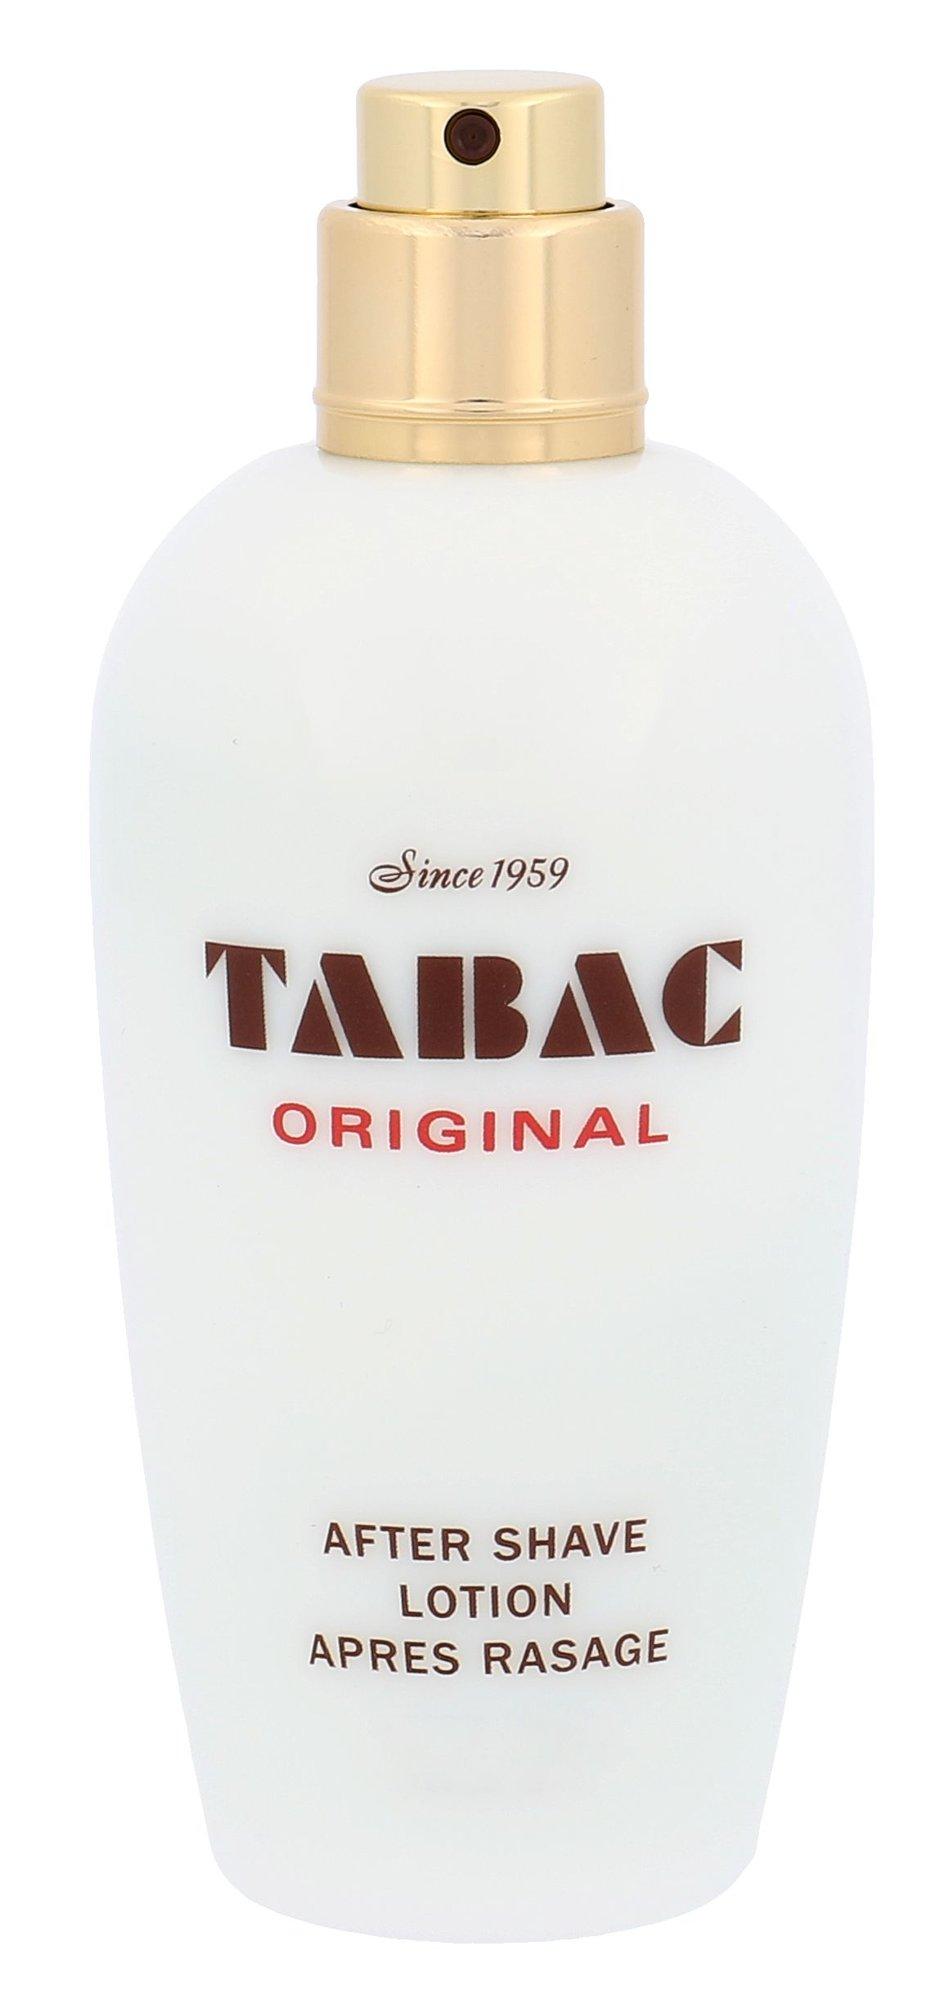 Tabac Original Aftershave 50ml